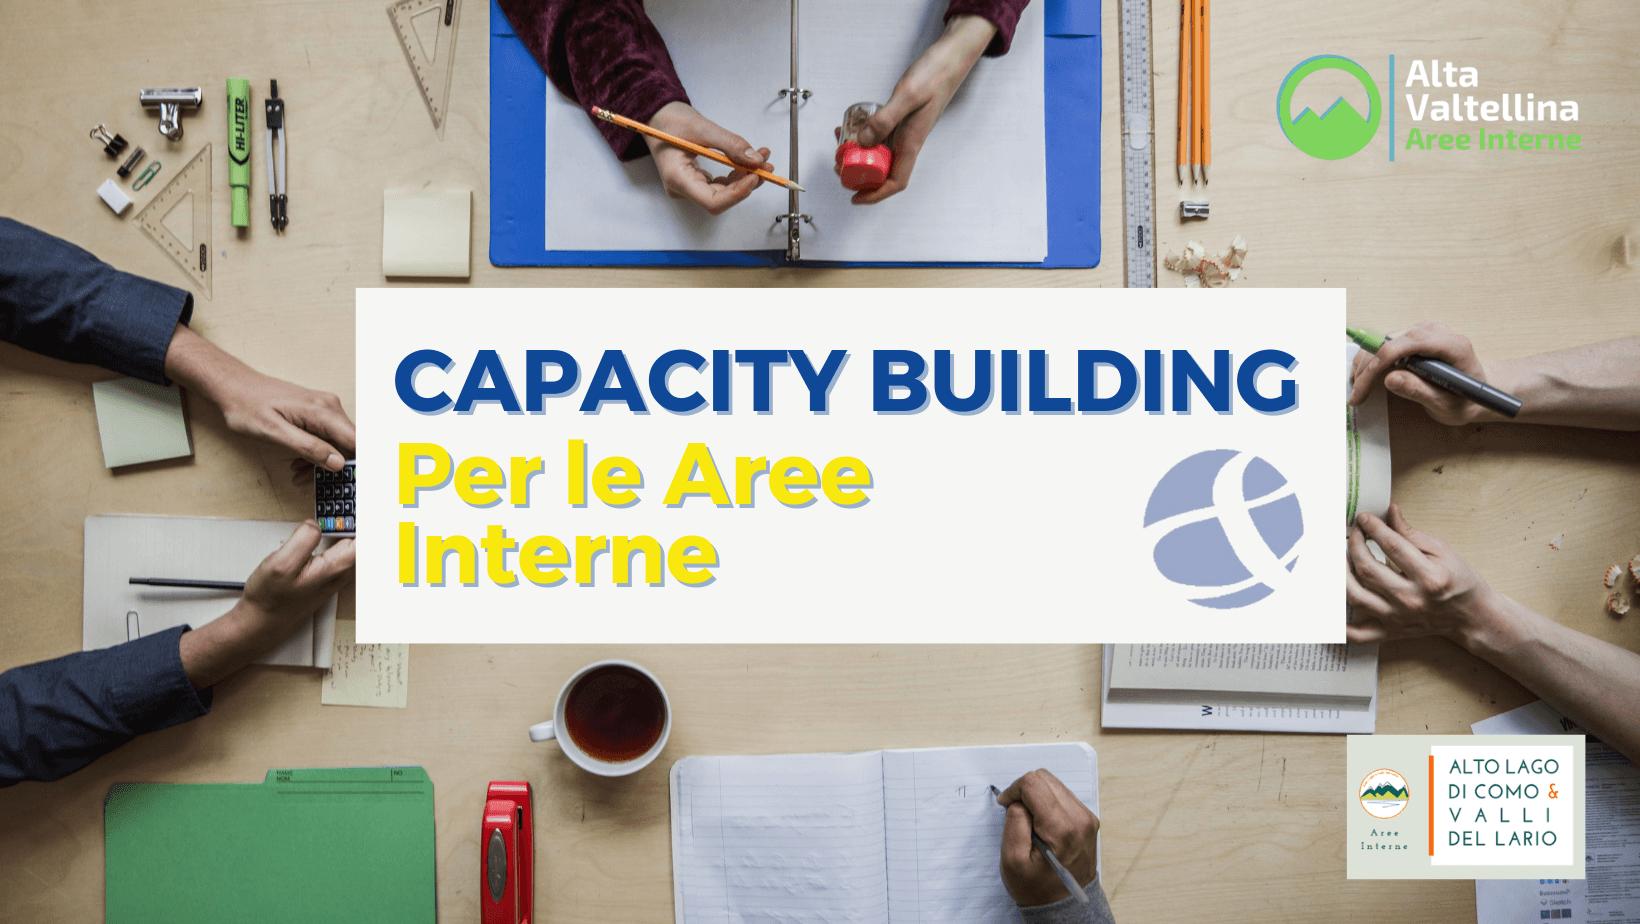 Capacity Building per le Aree Interne